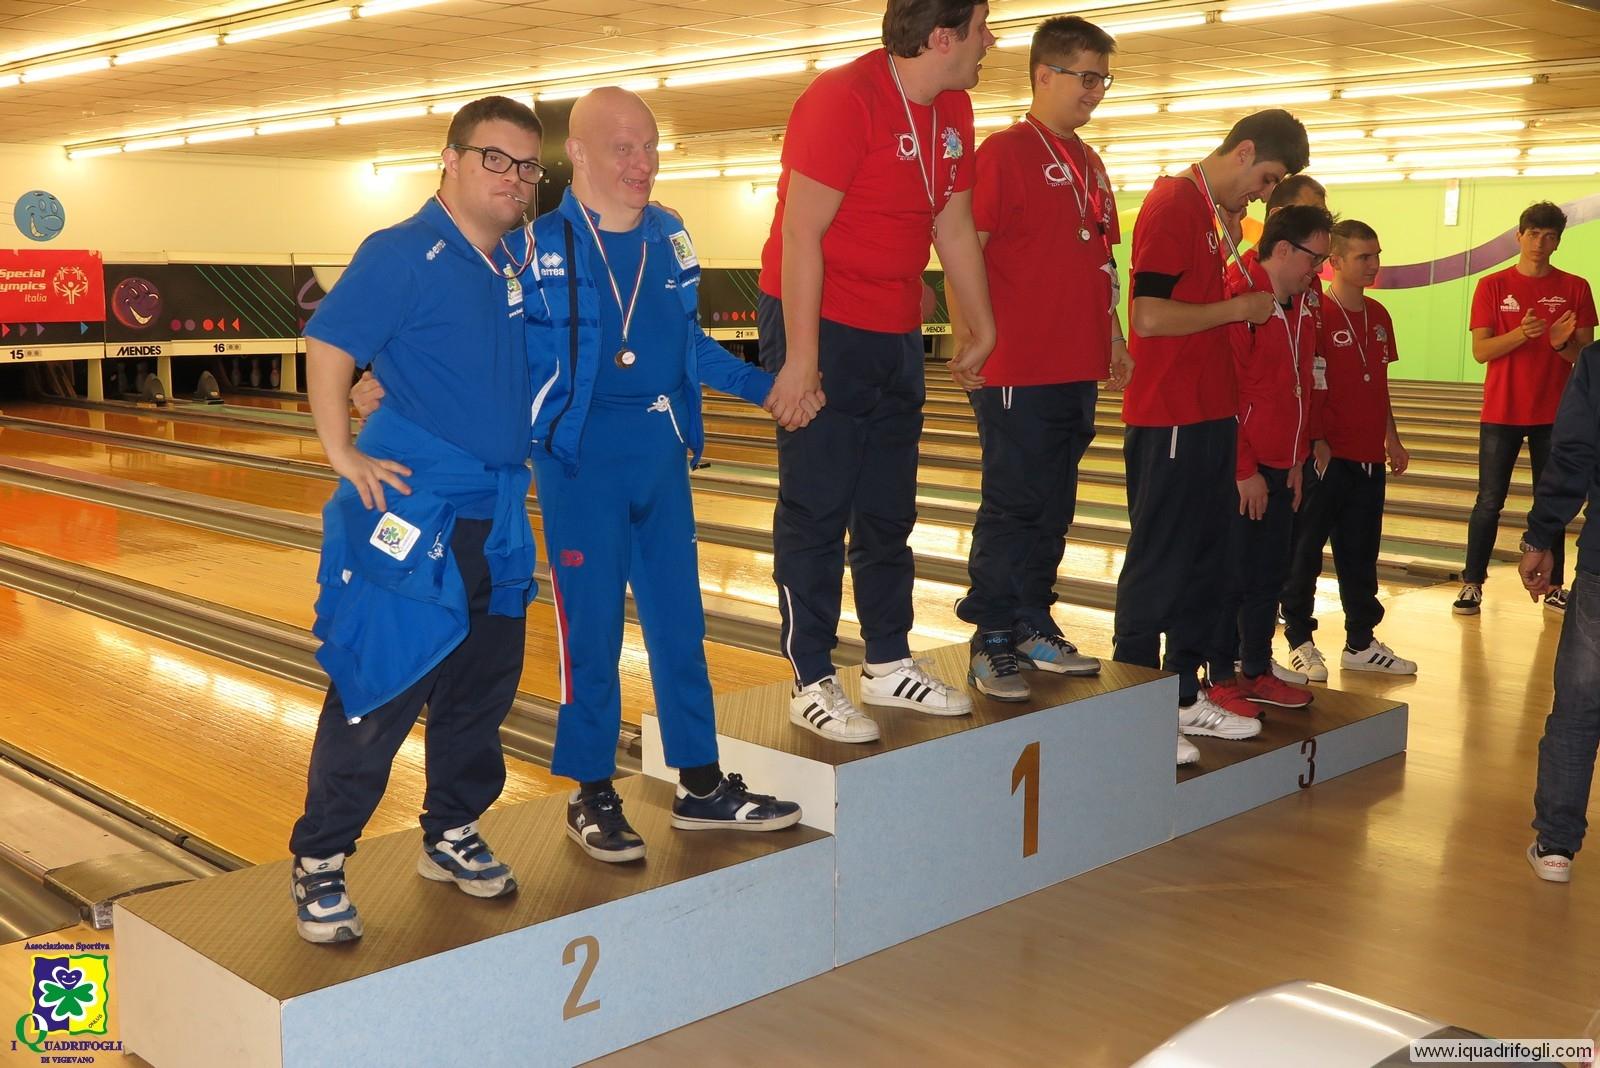 Bowling Nerviano 2019 - Regionali - 156